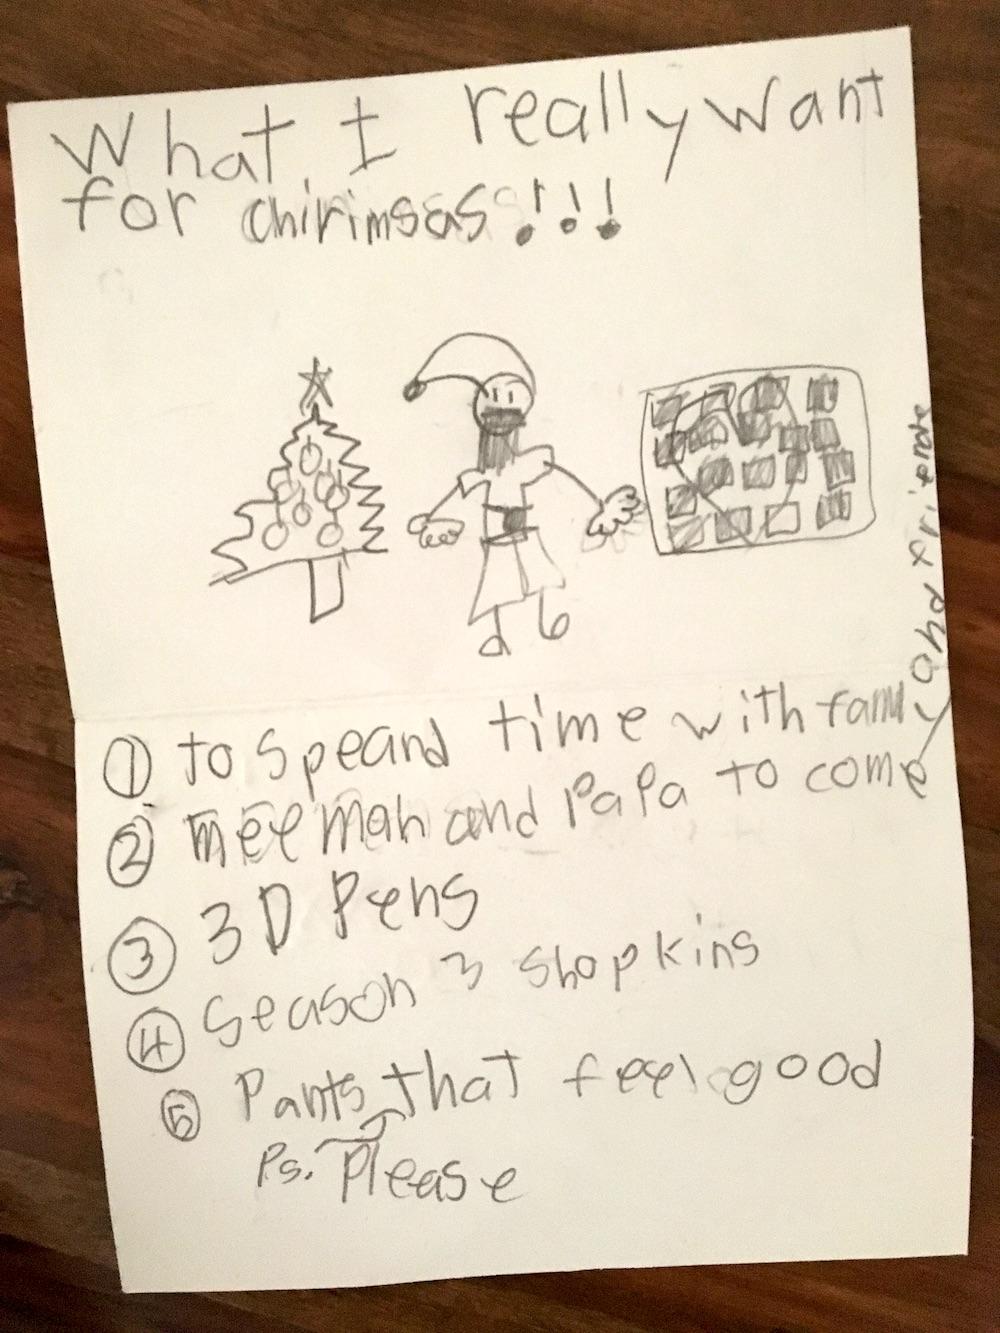 Scarlet's Christmas List 2015